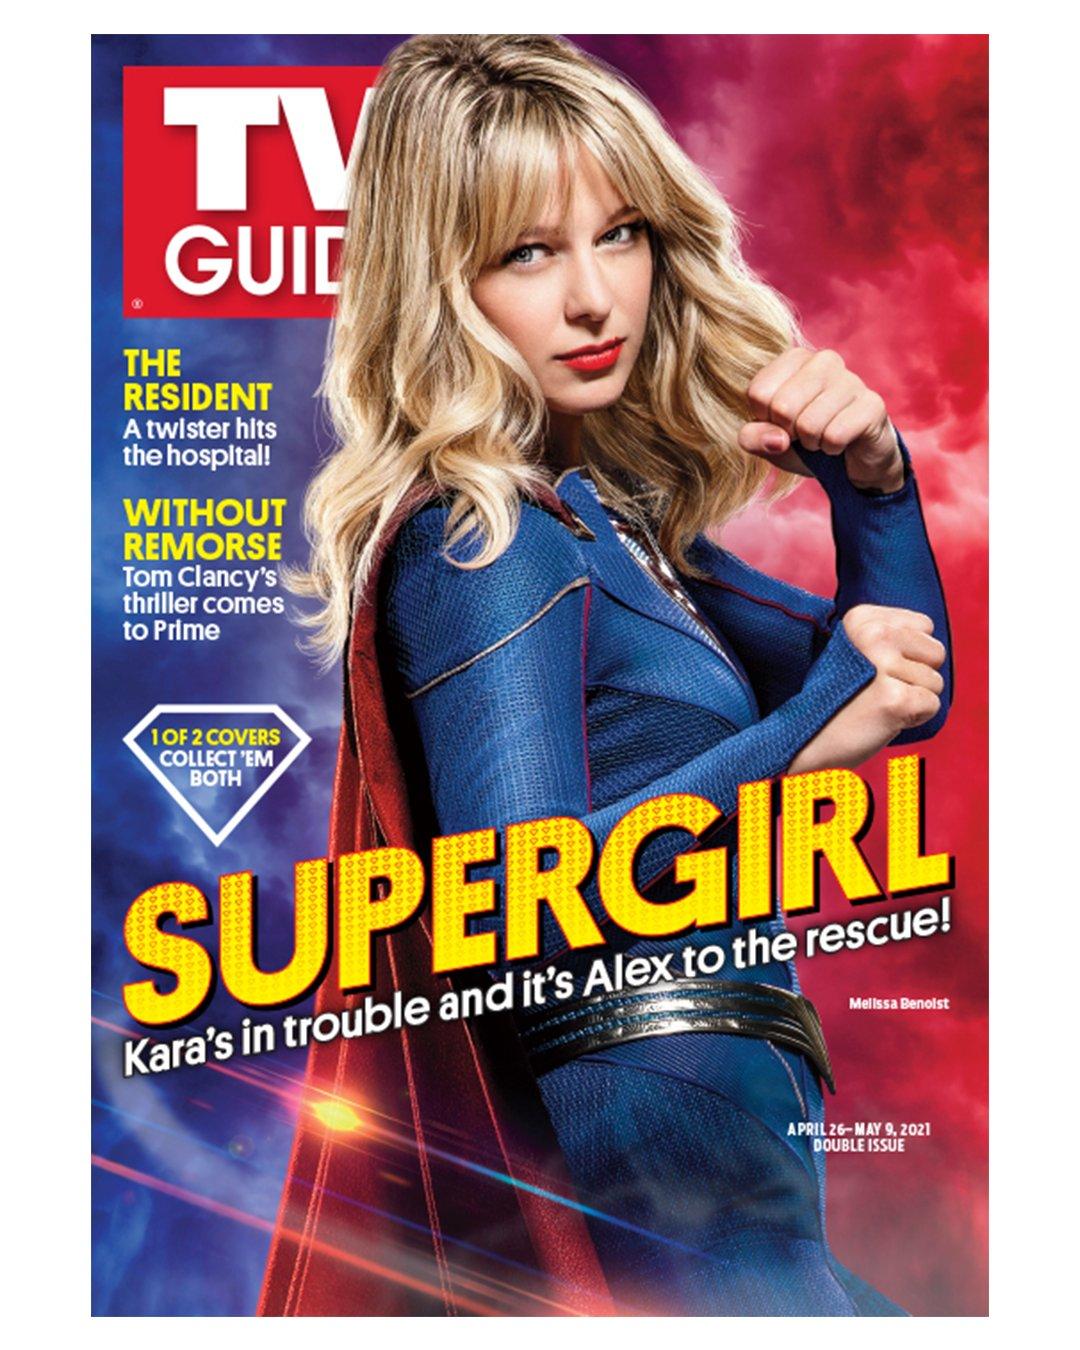 https://www.supermanhomepage.com/clickandbuilds/SupermanHomepage/wp-content/uploads/2021/04/TVGuide-Supergirl2021b.jpeg